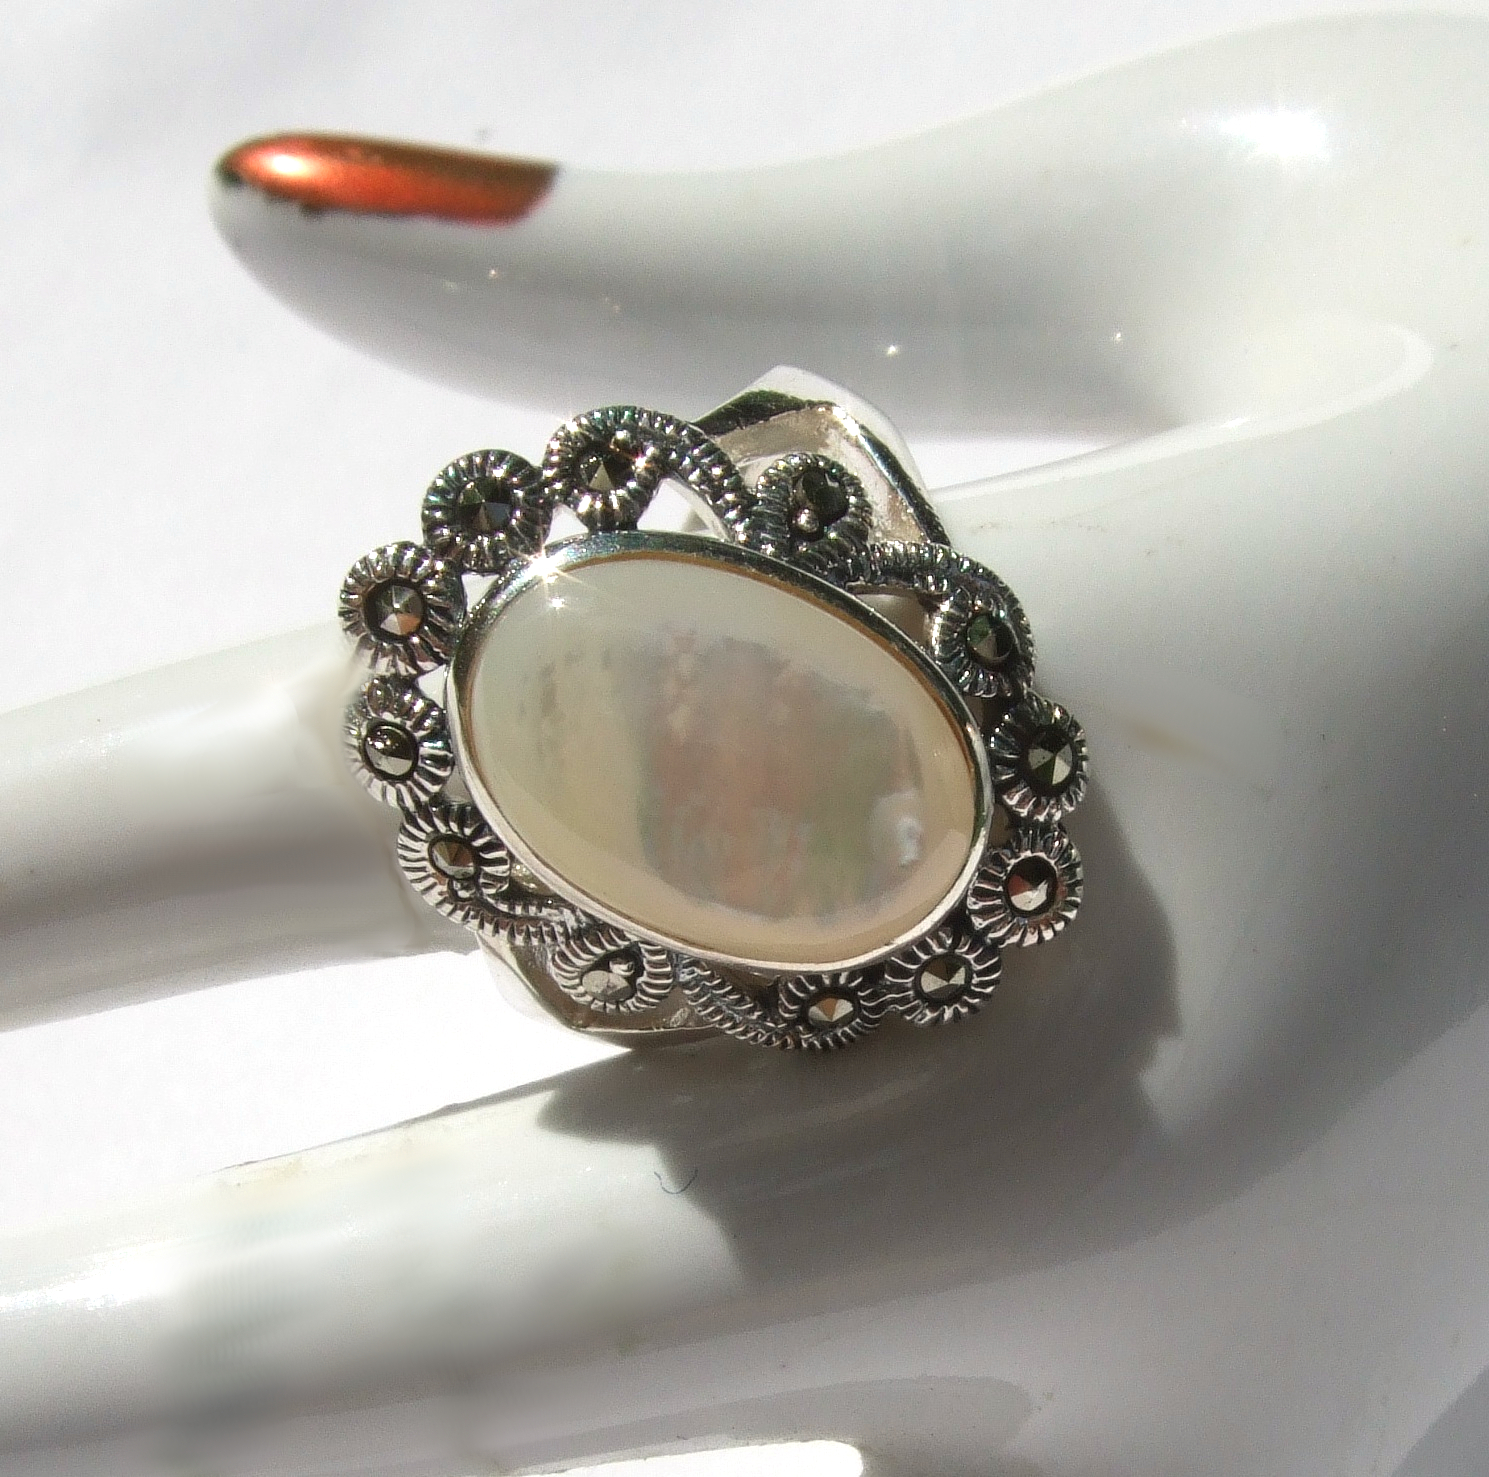 markasitschmuck silbermondschimmer perlmutt markasit silber ring. Black Bedroom Furniture Sets. Home Design Ideas